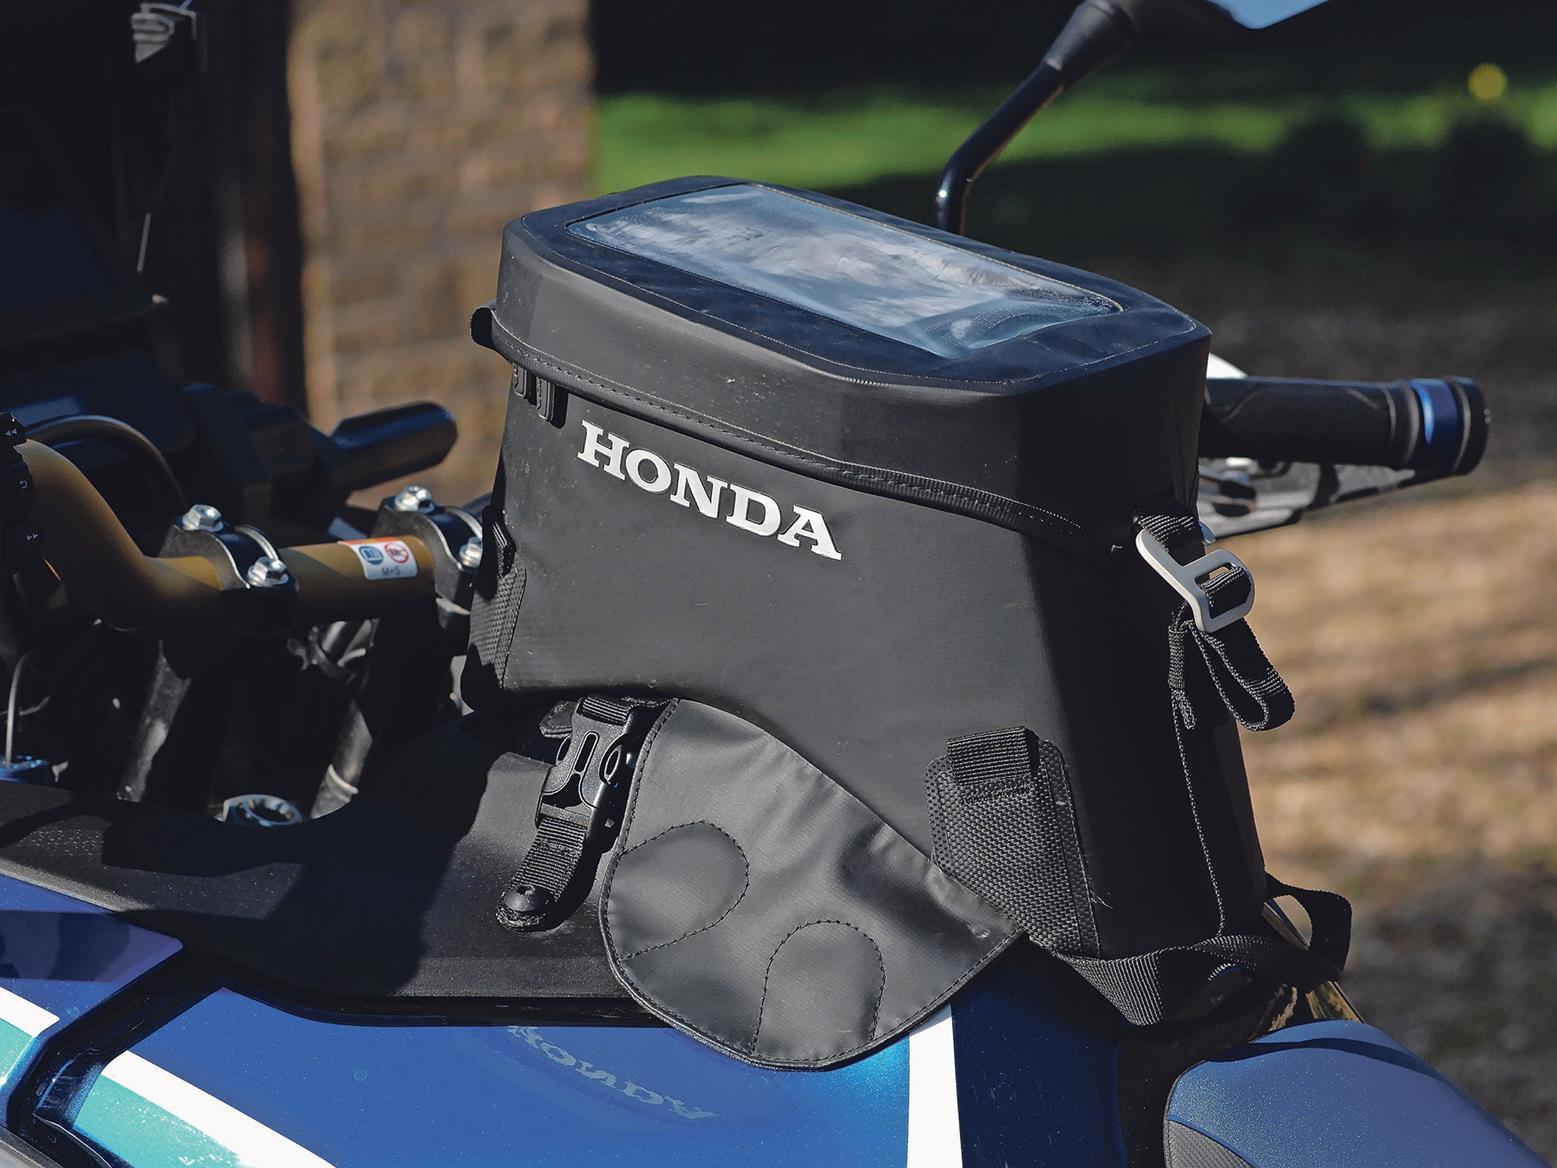 Honda Africa Twin AS ES Plus tankbag